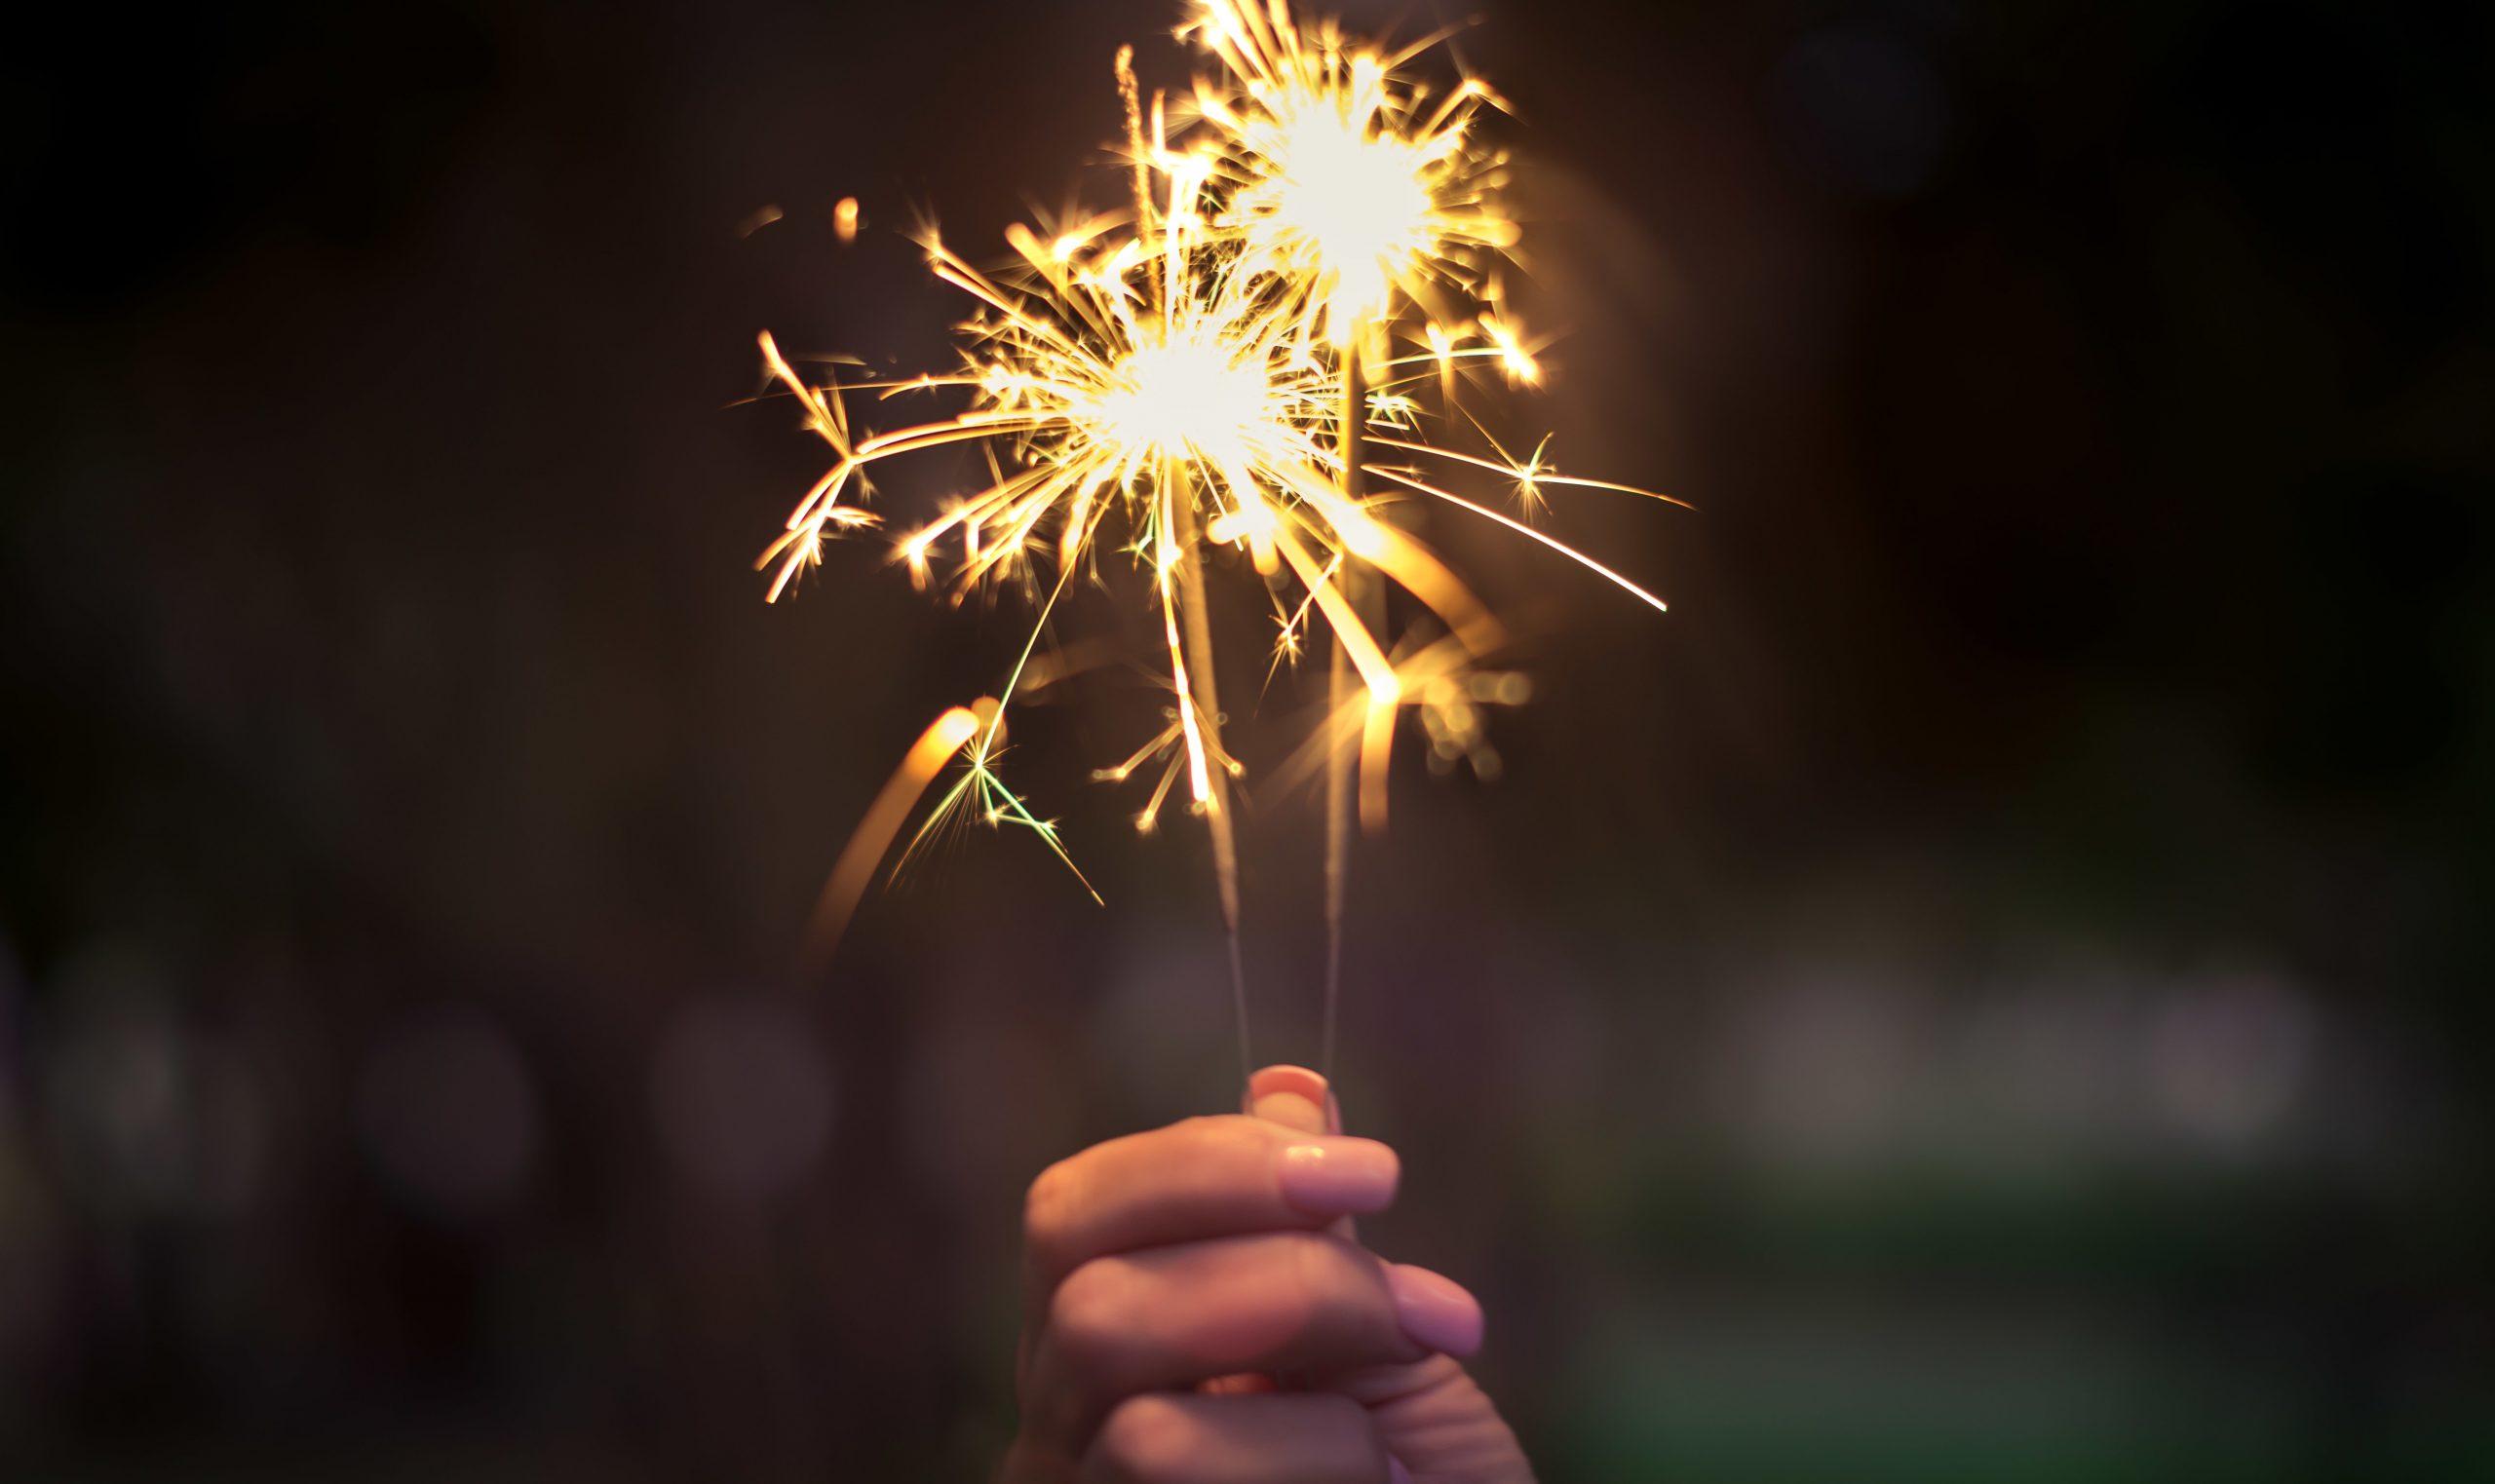 hand holding lit sparklers